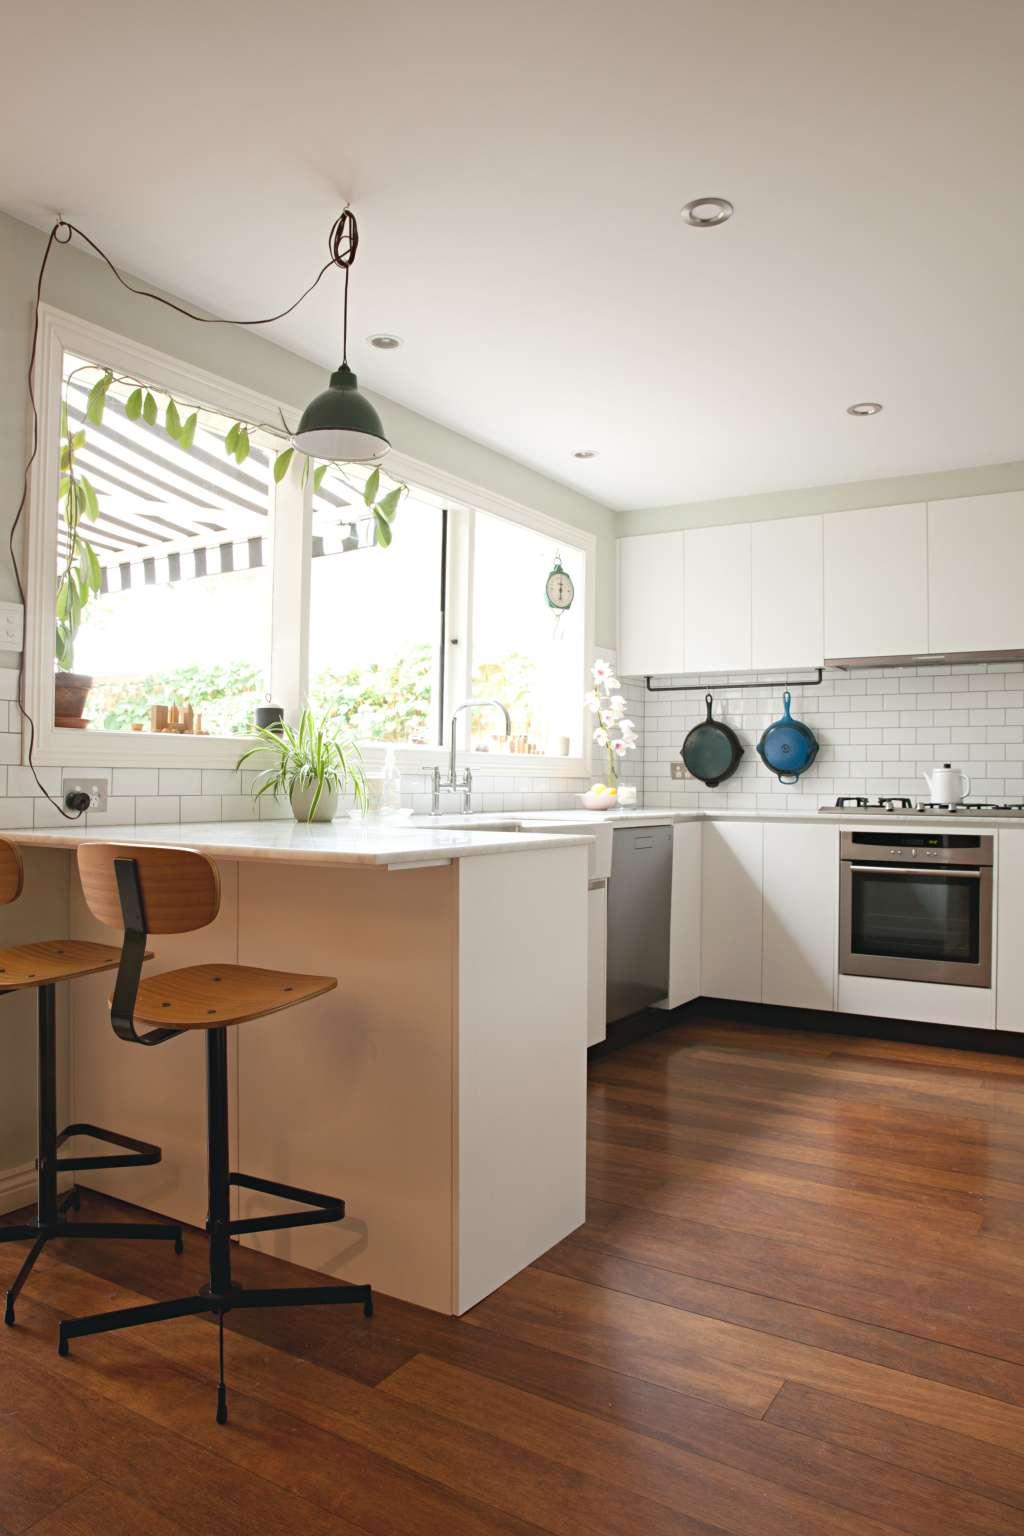 House Tour: A Vintage & Modern Melbourne Home